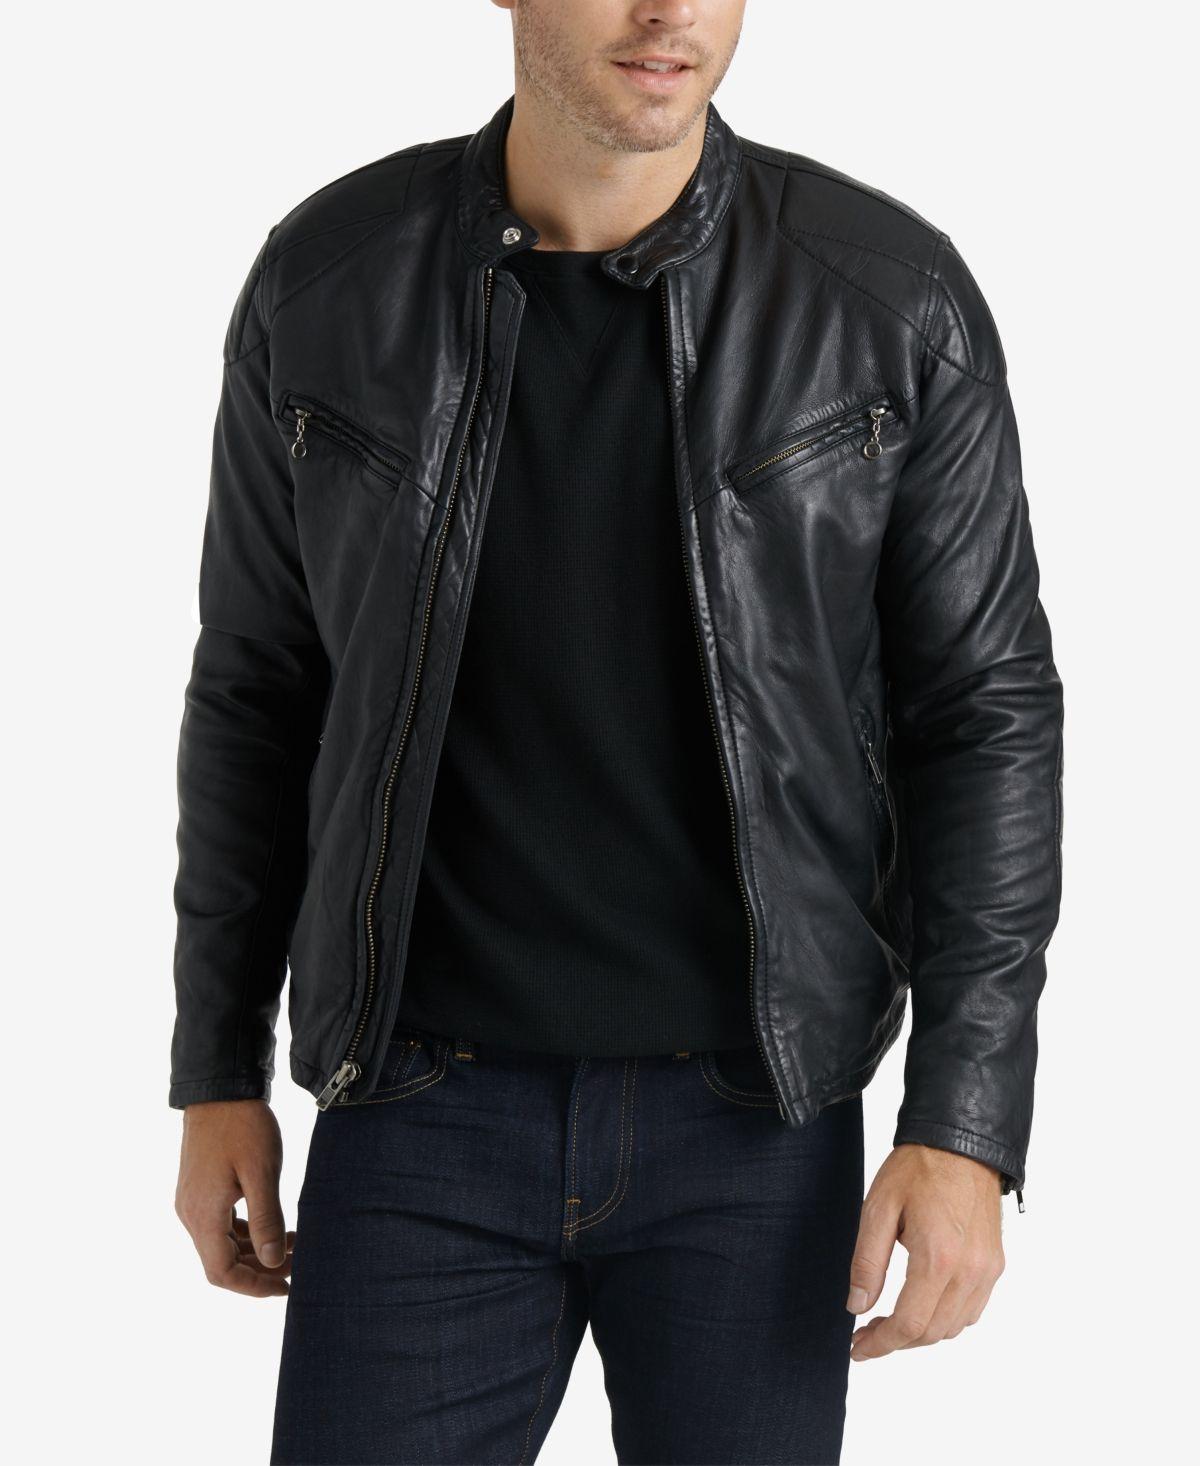 Lucky Brand Men S Leather Jacket Black Black Leather Jacket Men Leather Jacket Men Style Men S Leather Jacket